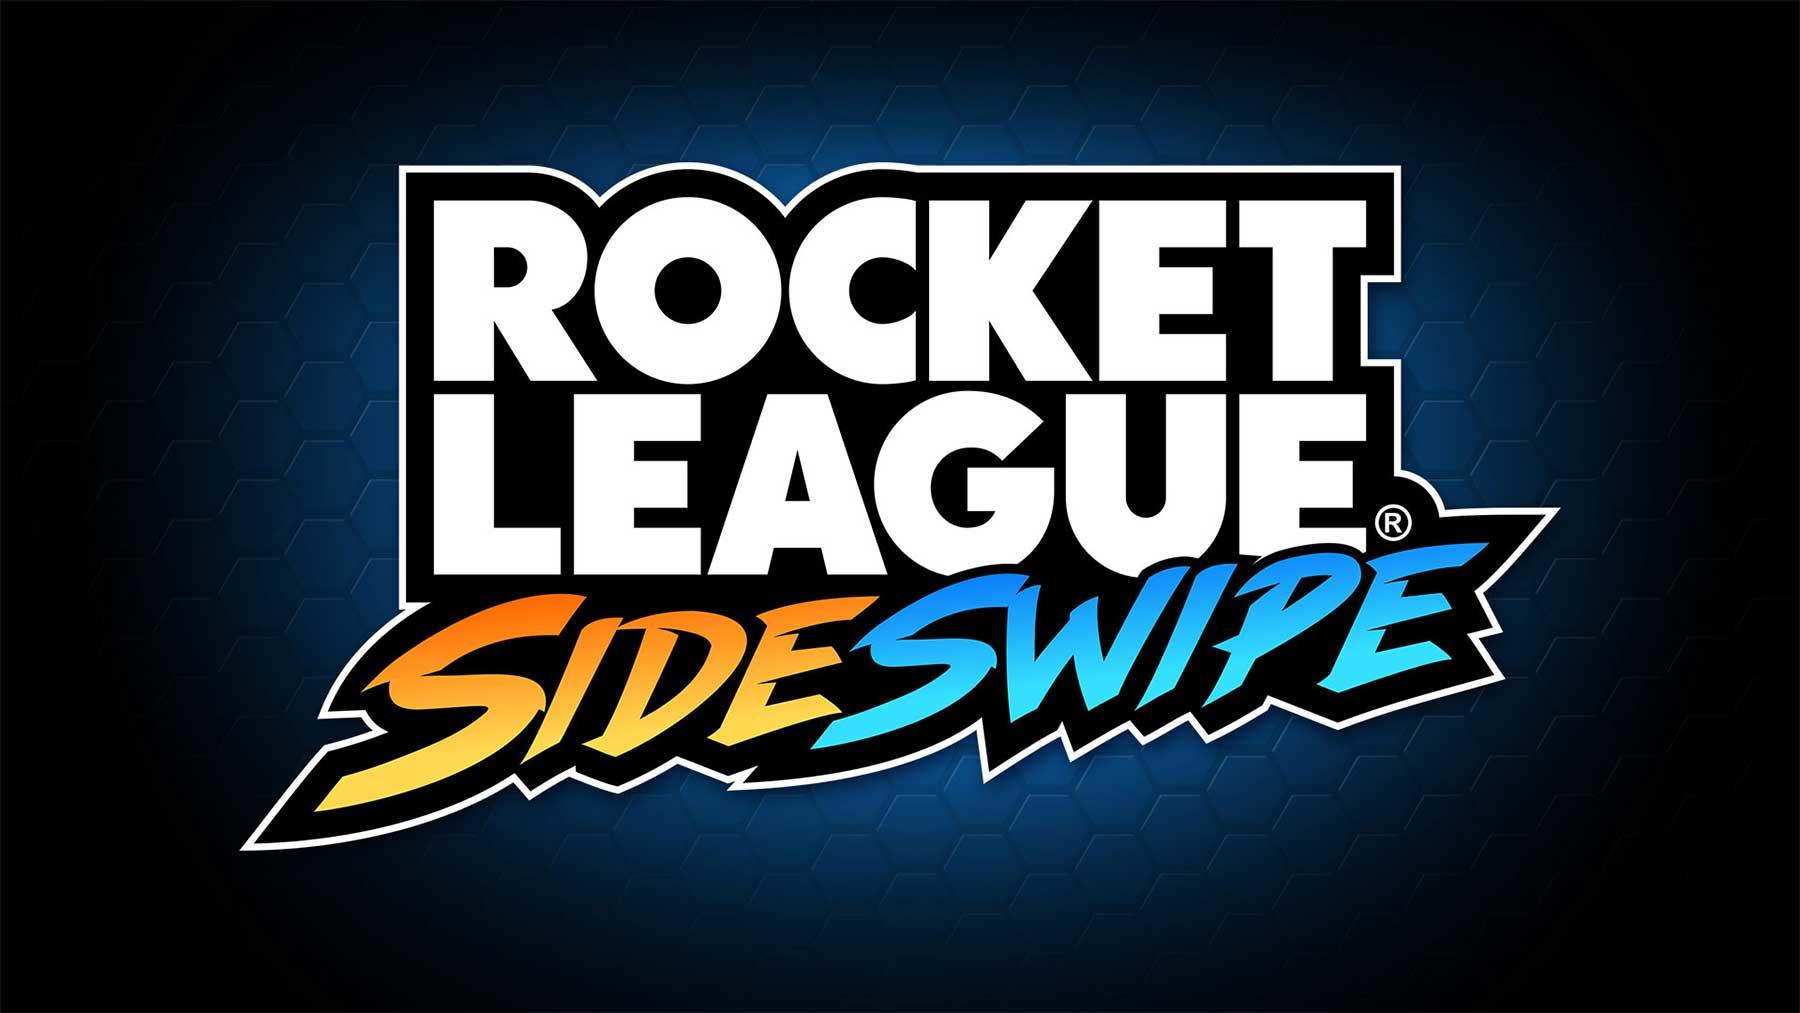 """Rocket League"" bekommt ein Mobile Game Rocket-League-SideSwipe-mobile-game"